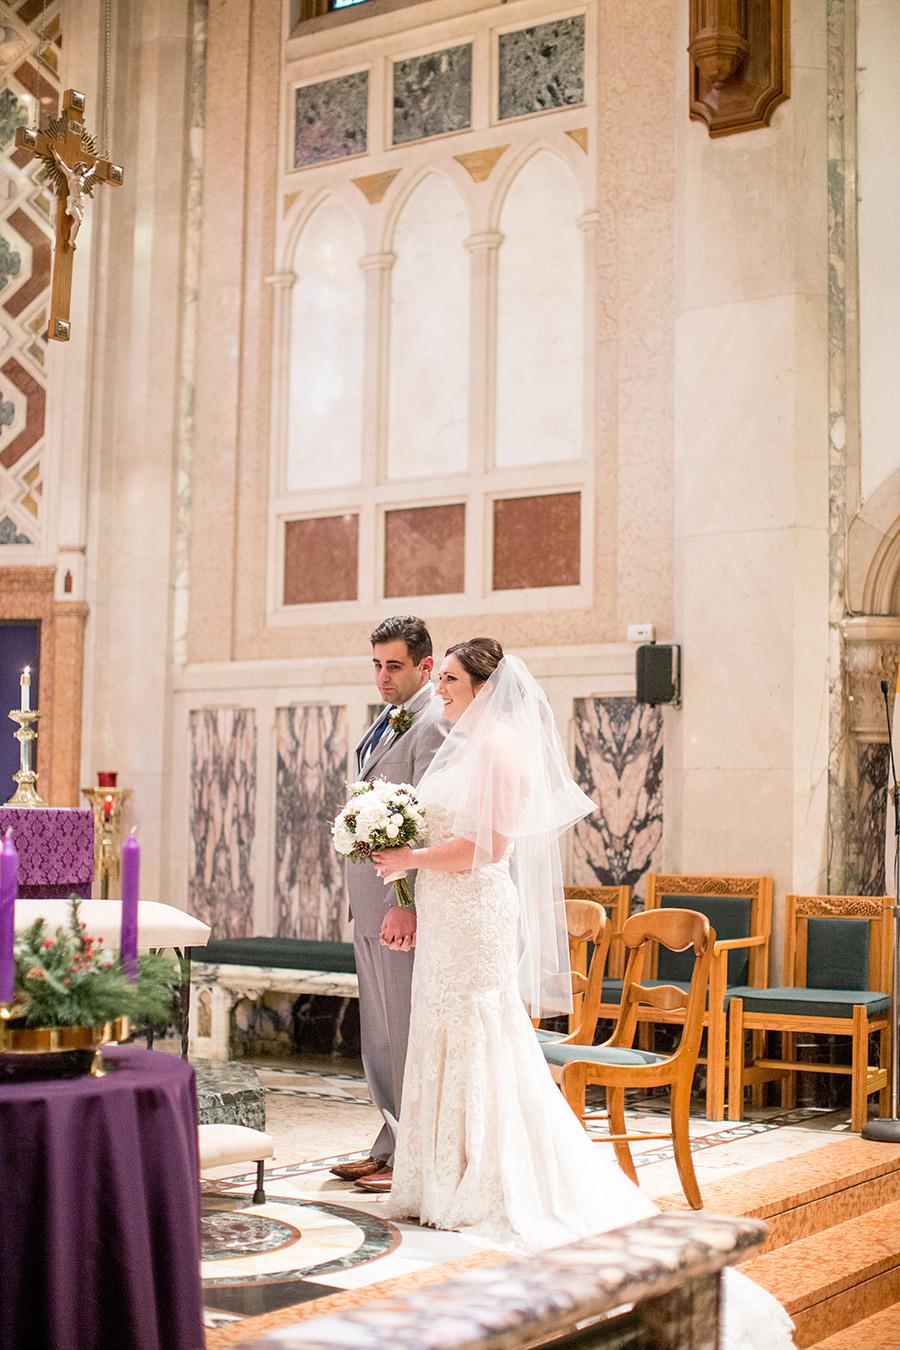 wedding sacrament at catholic church